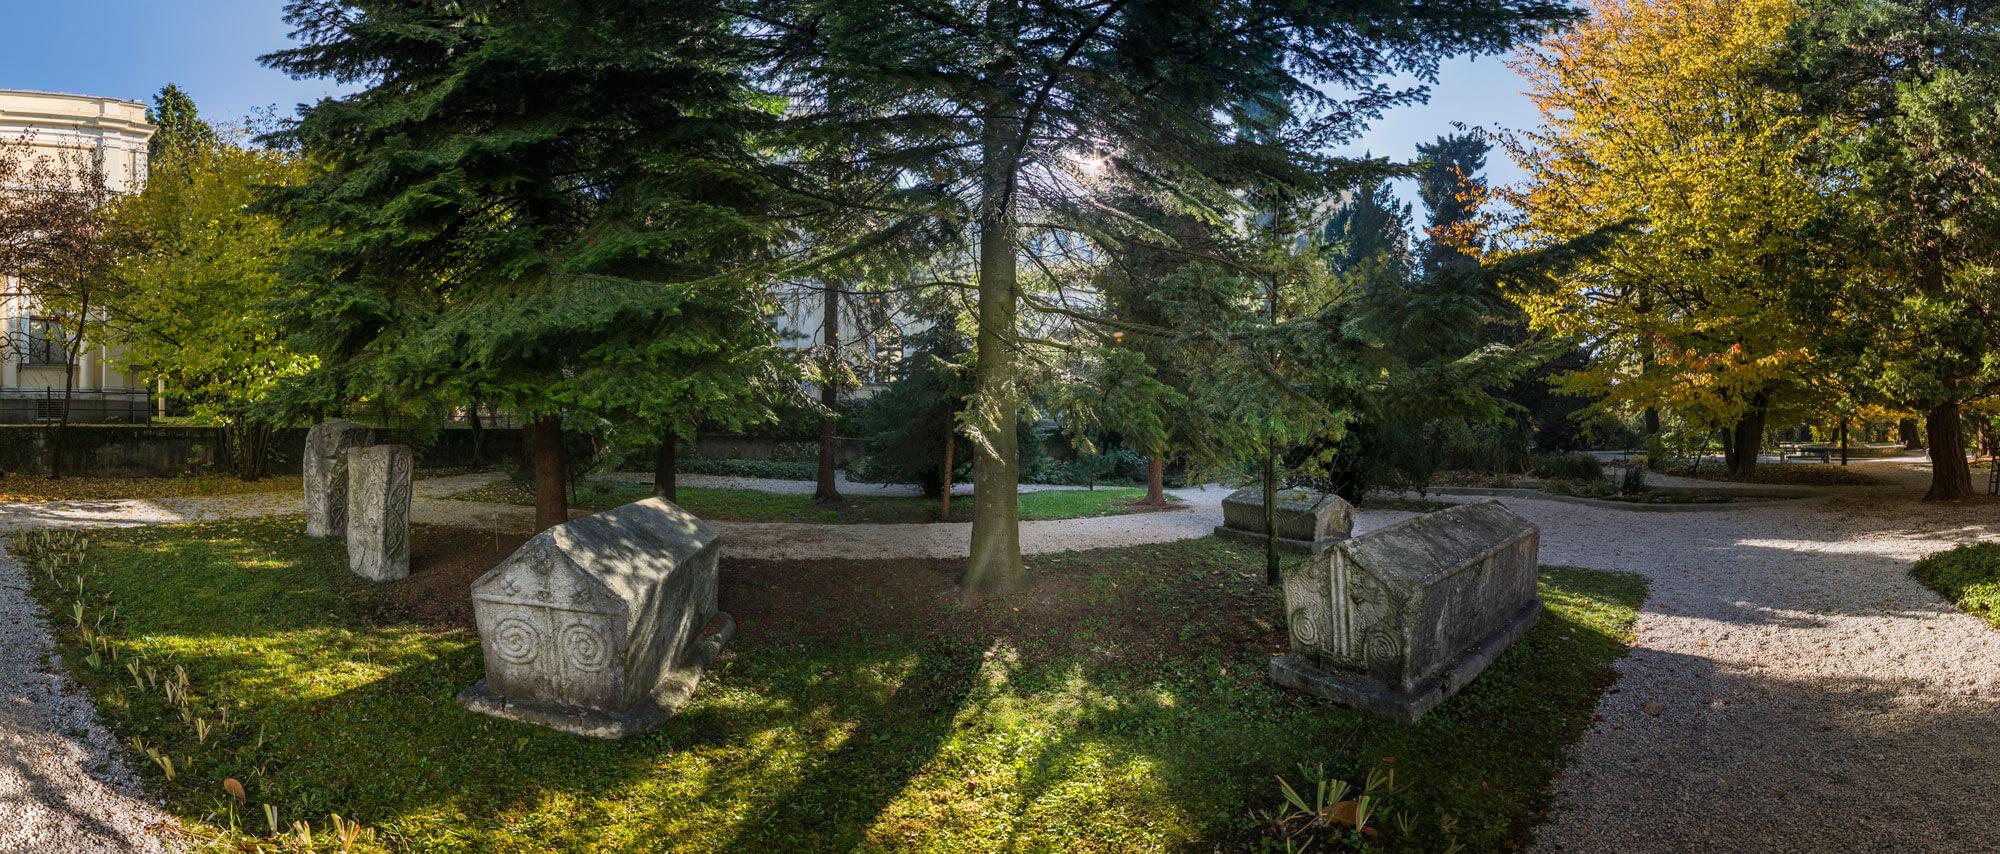 Botanicki Vrt Zemaljski Muzej Bosne I Hercegovine